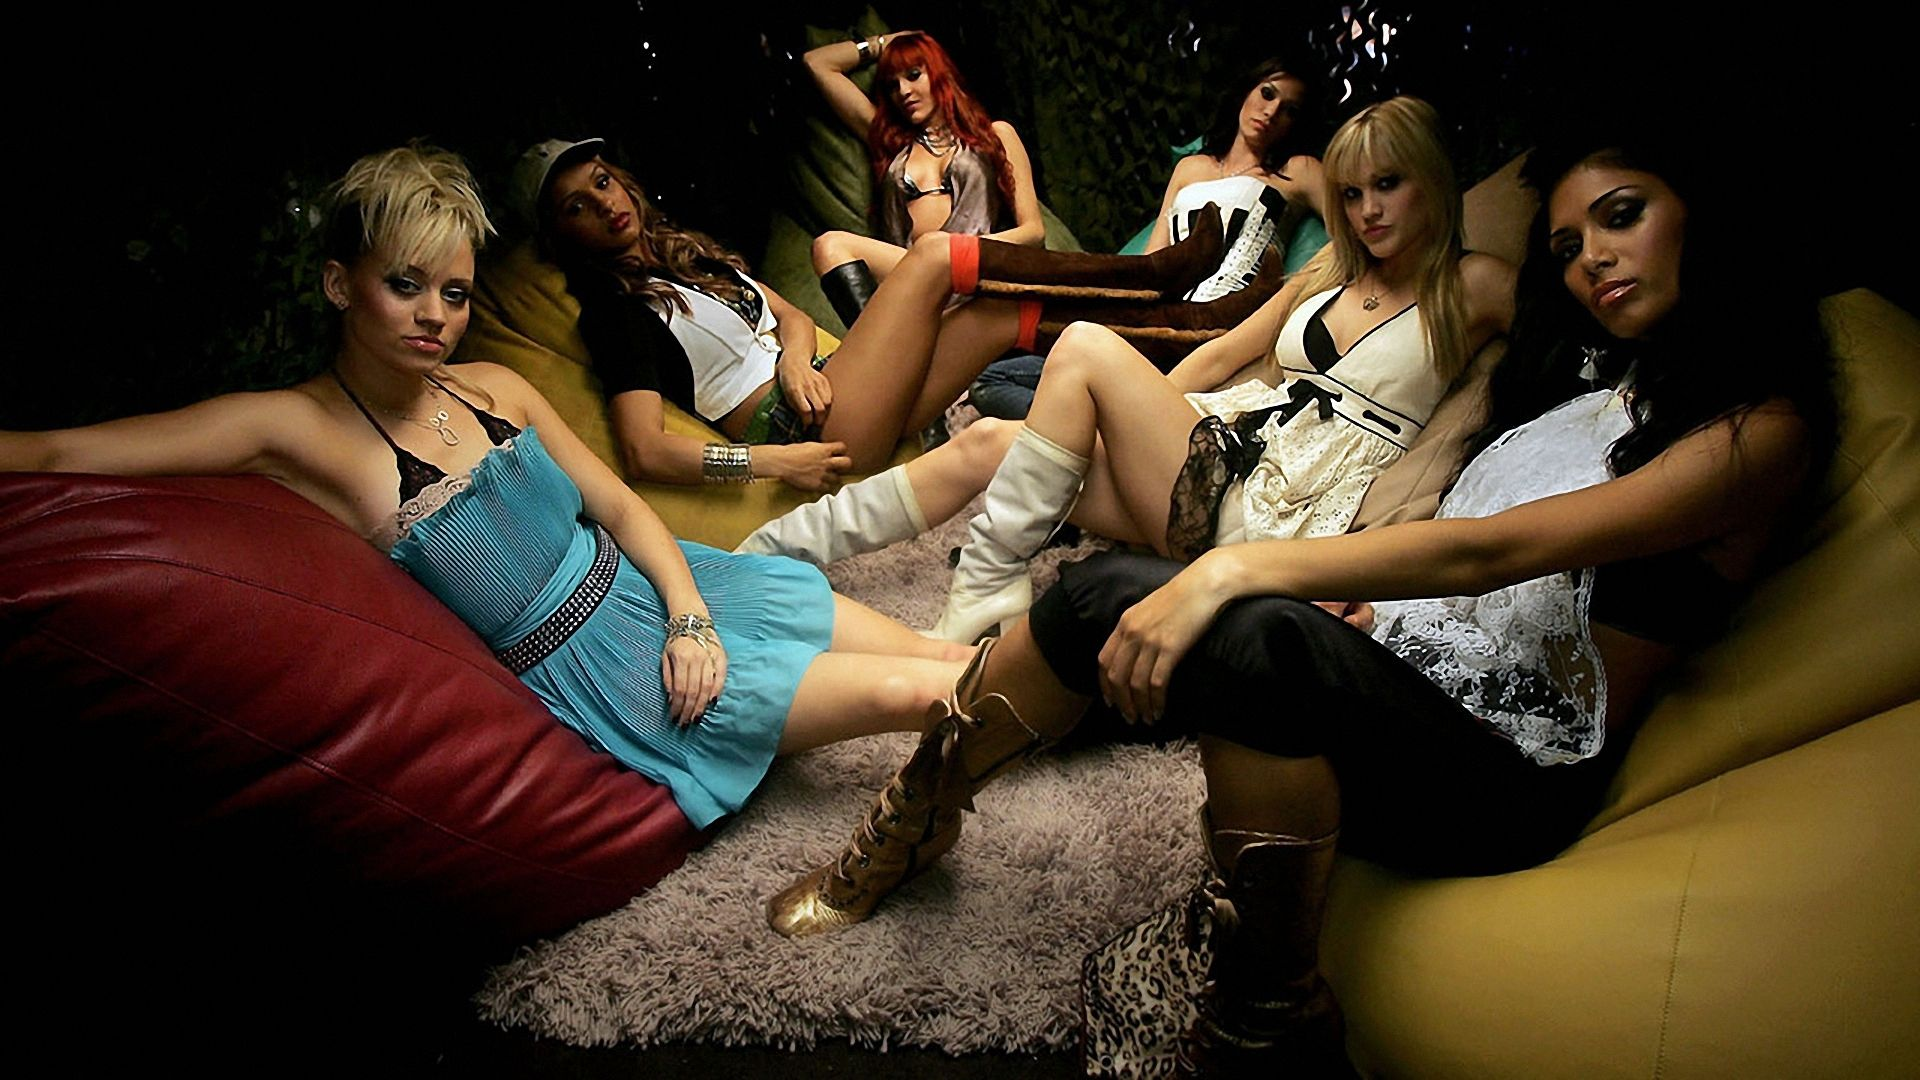 How girls relax 18